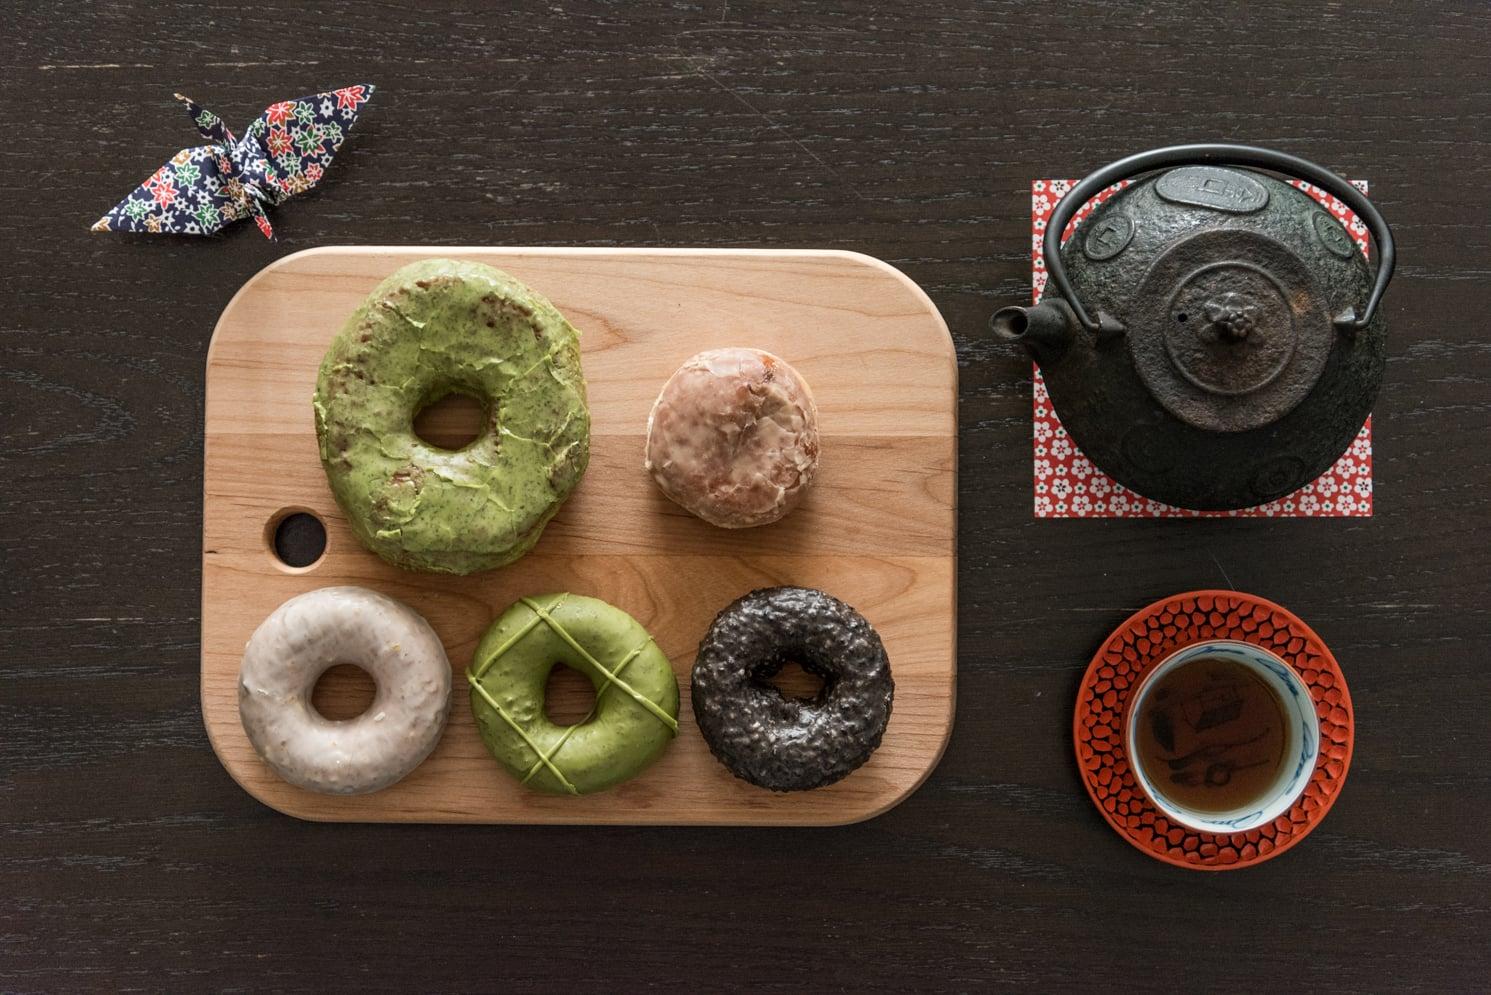 rock mama nyc lifestyle blog - doughnut plant japanese flavors